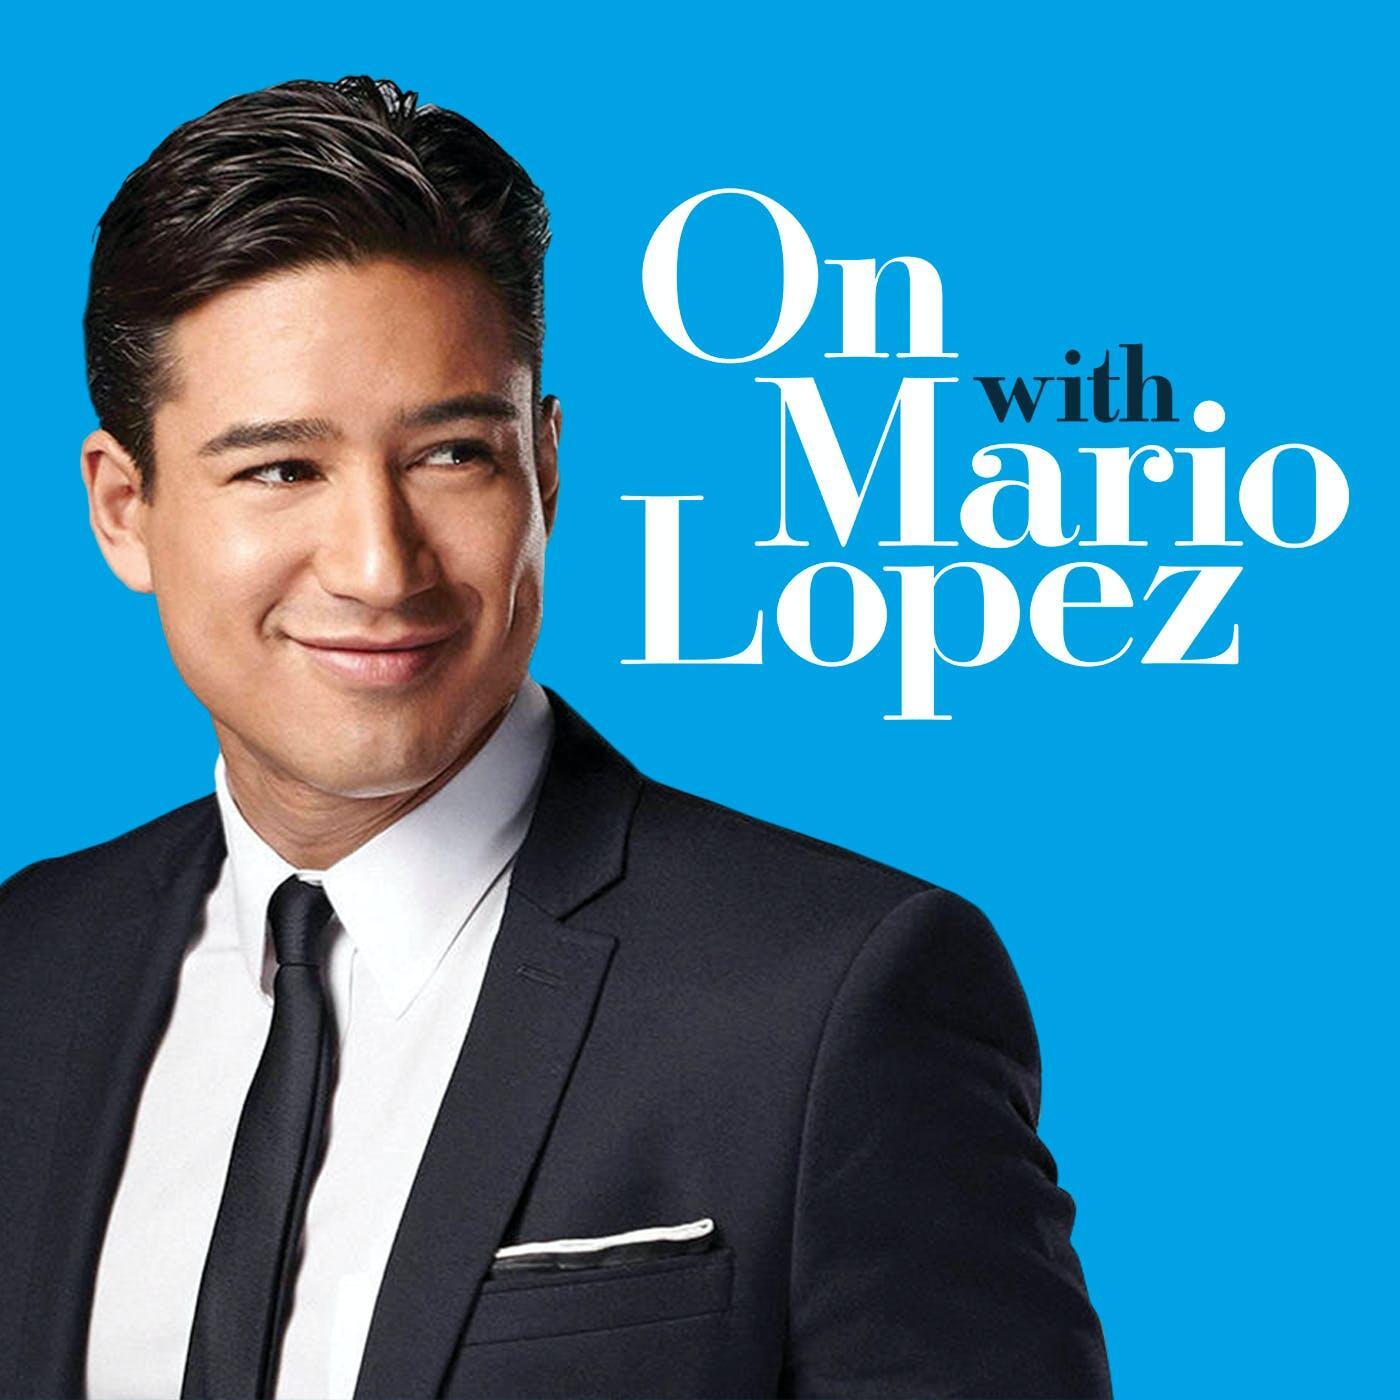 Listen to Martin Kove (Karate Kid/Cobra Kai) | ON With Mario Lopez - Interviews | Podcasts